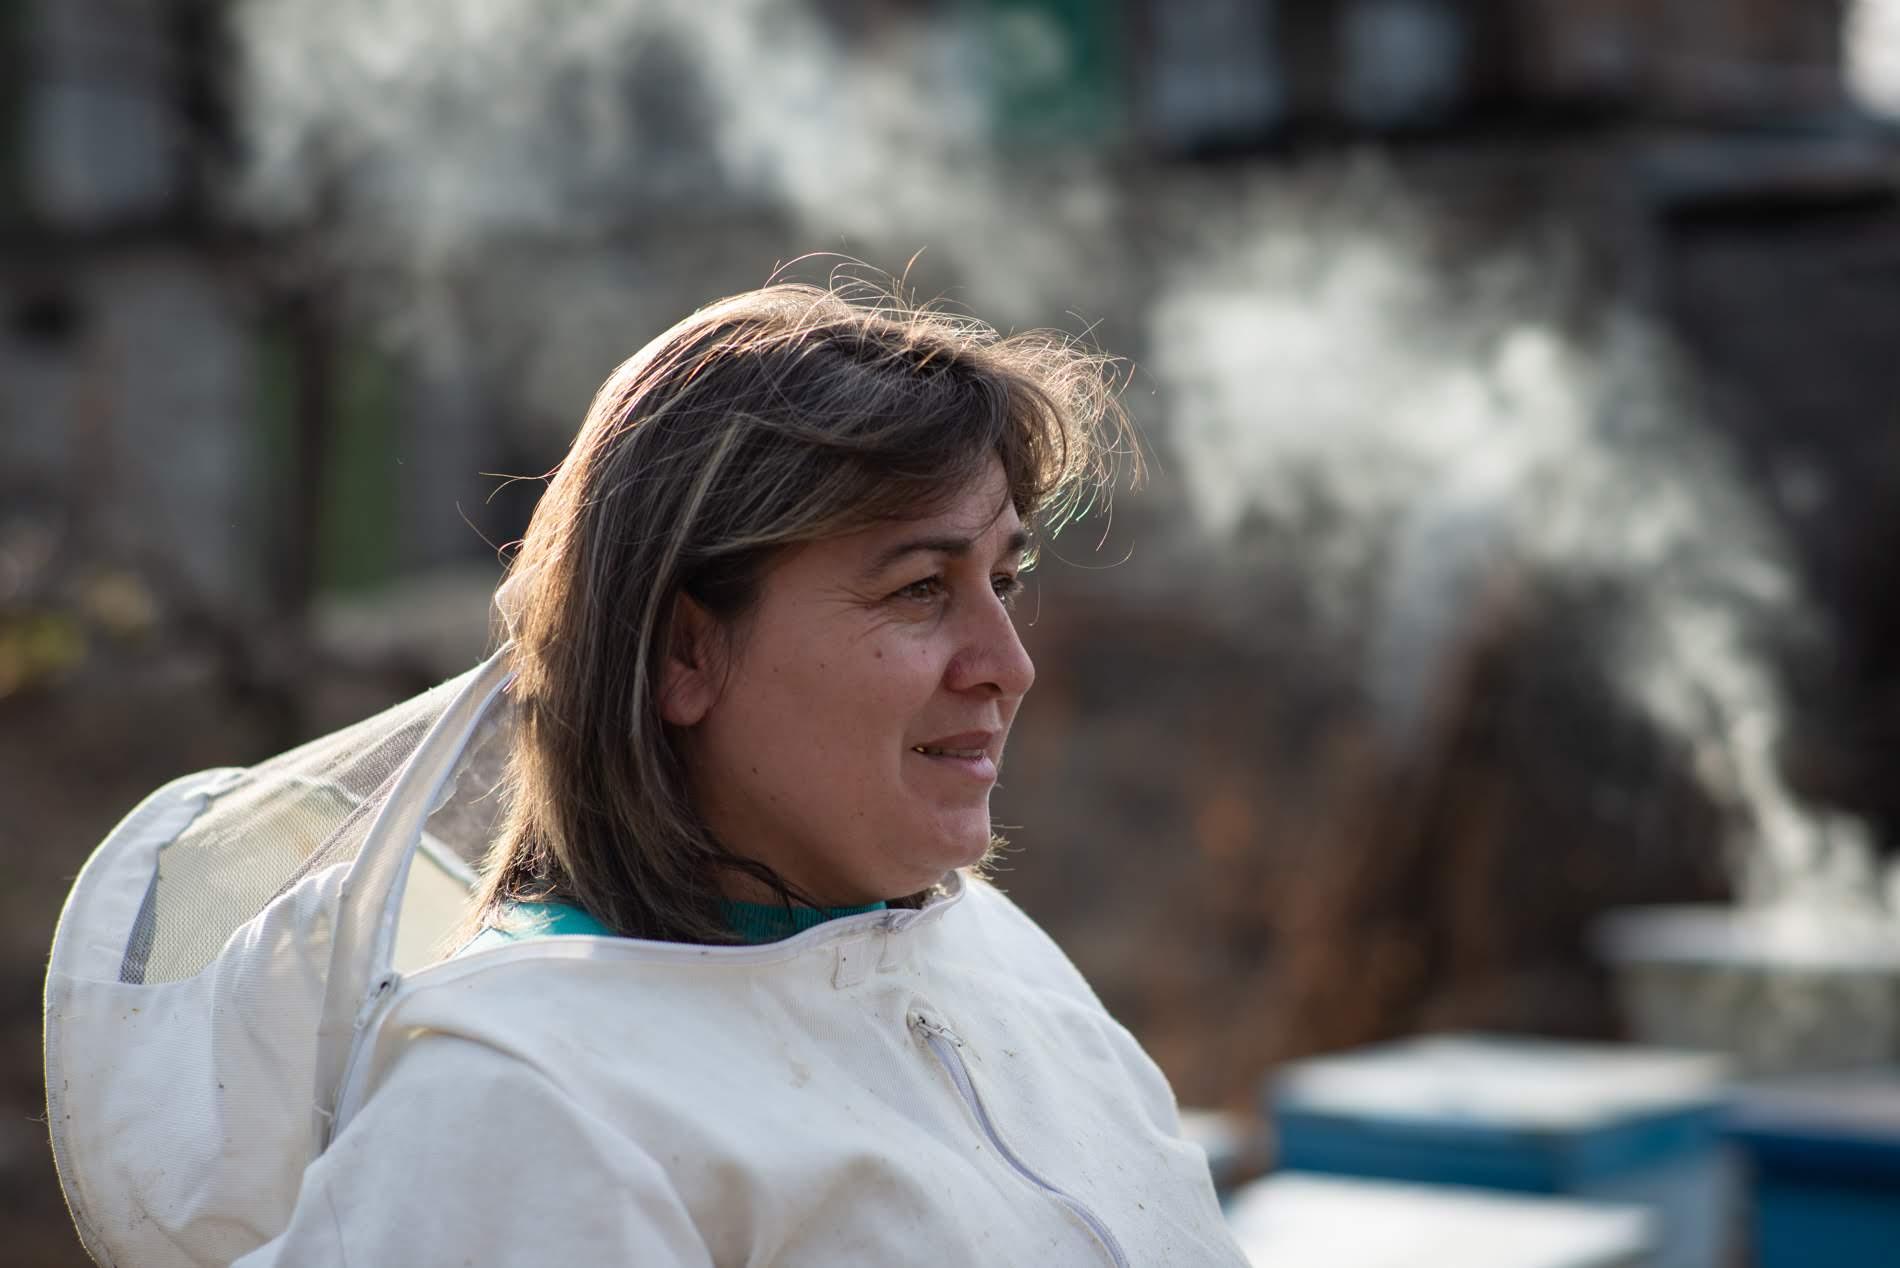 Beekeeping is between 20%-30% of the Katsiashvili family income.  Photo: Tamuna Chkareuli/OC Media.